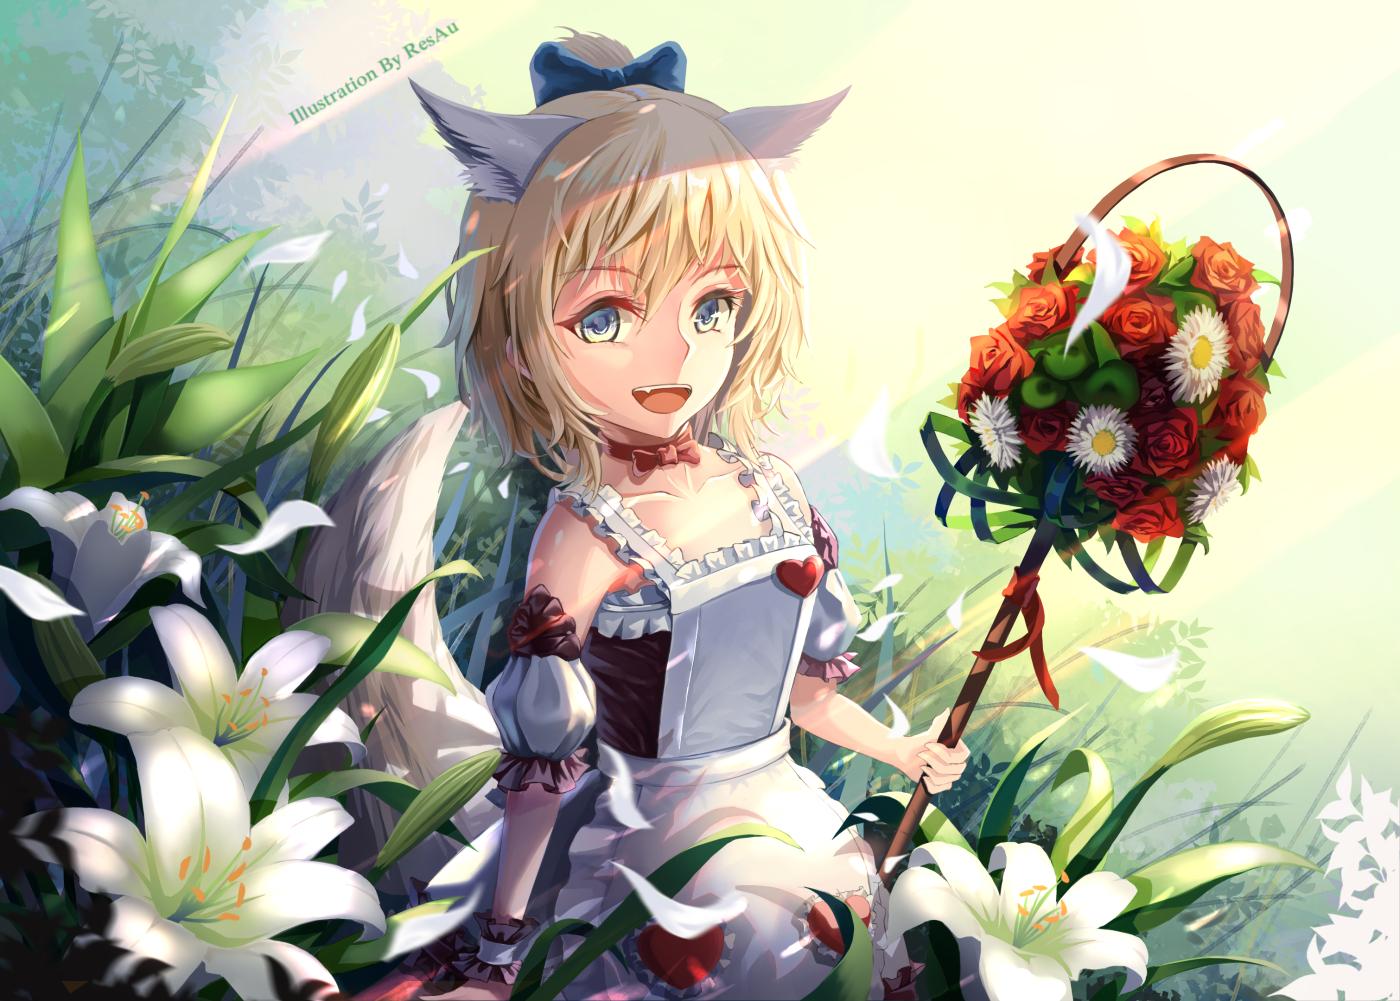 animal_ears apron blade_&_soul blonde_hair bow dress fang flowers petals resau short_hair tagme_(character) tail watermark wings